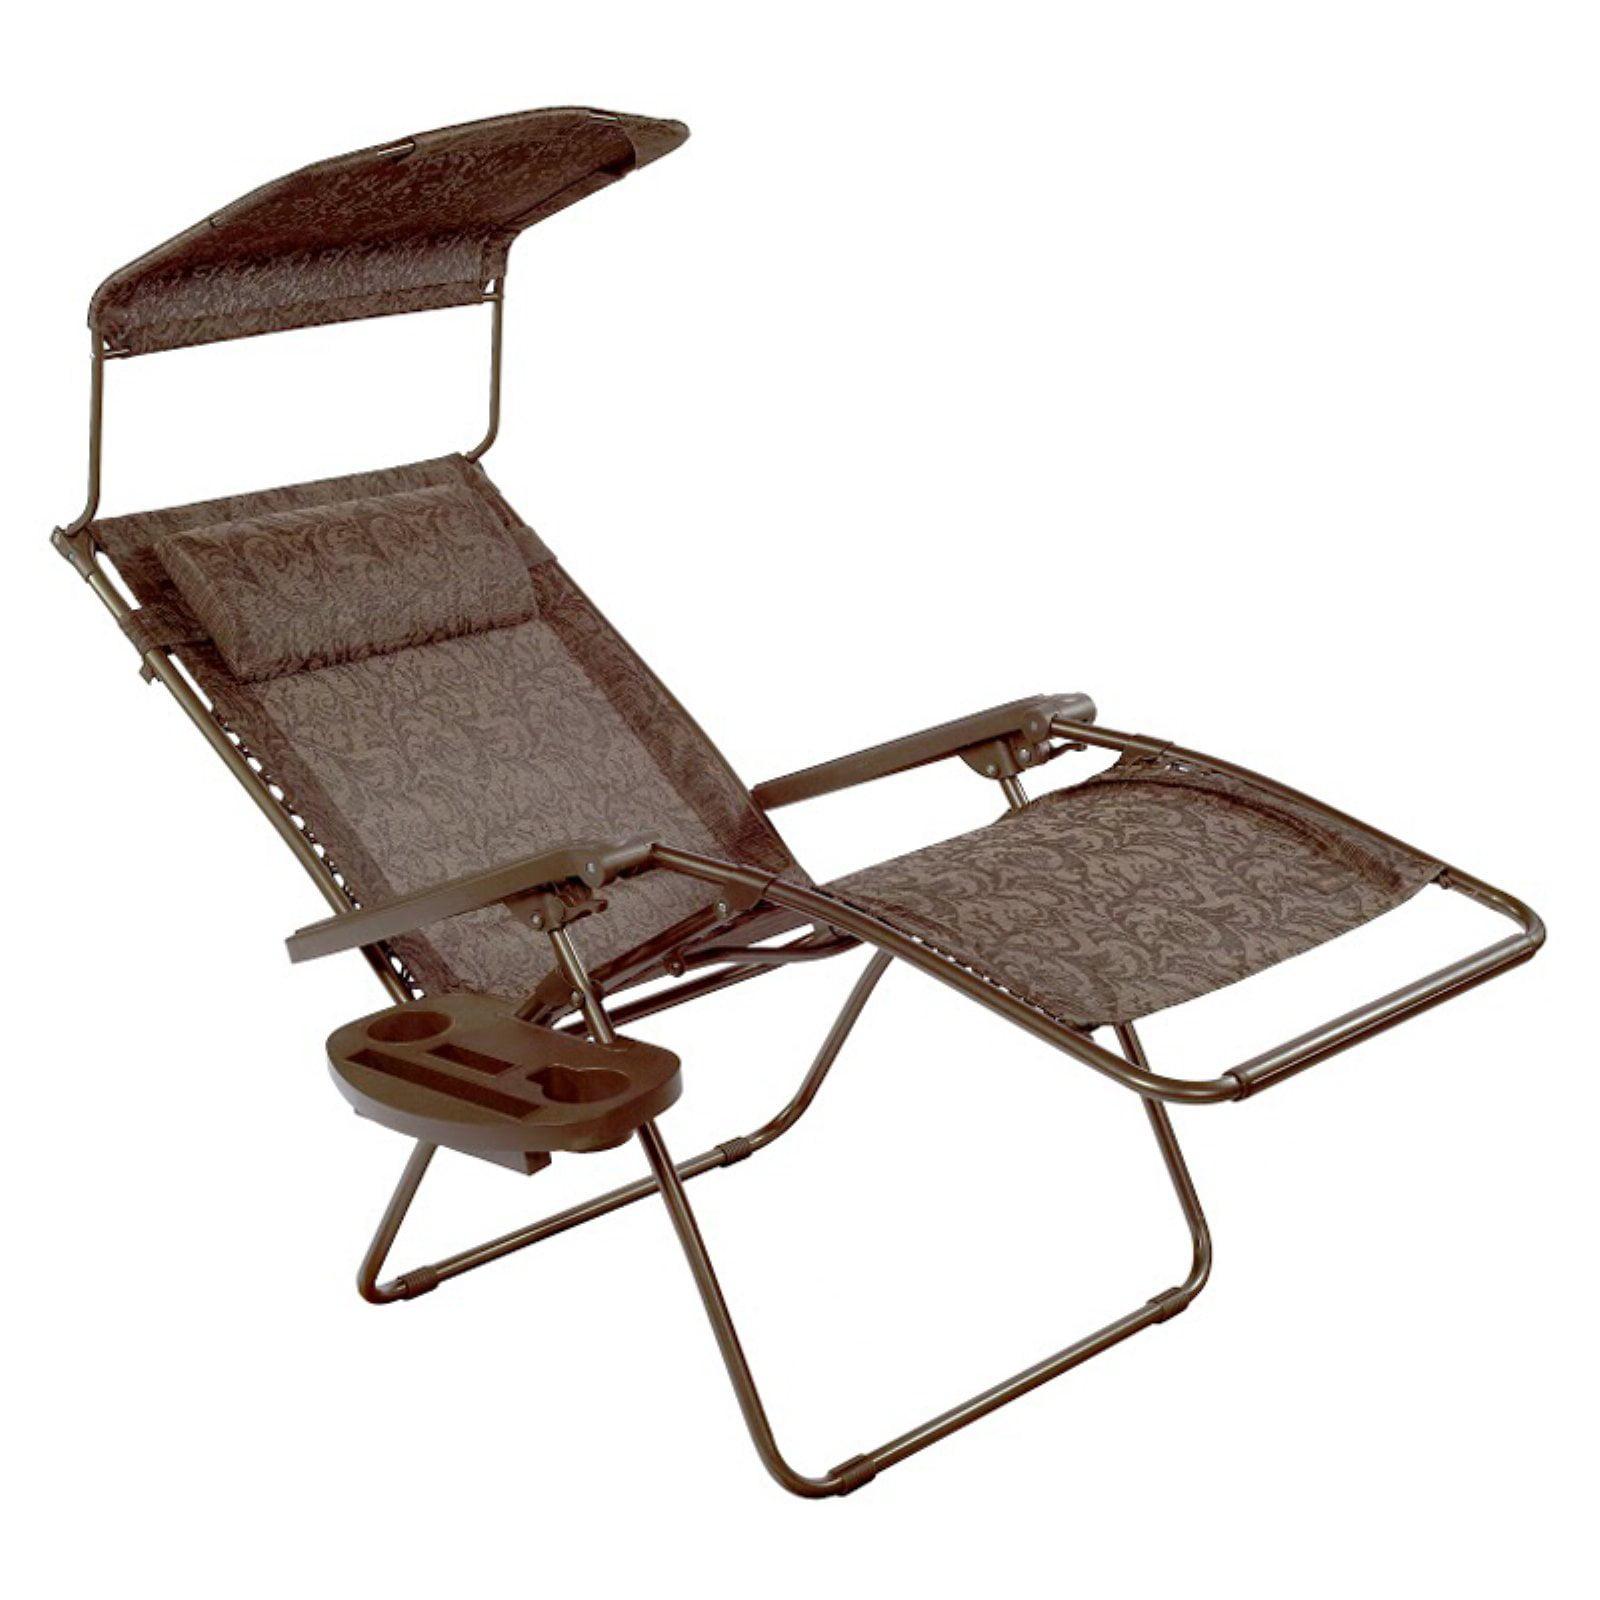 all bliss hammock c hammocks stools chairs gravity zero patio brand chair